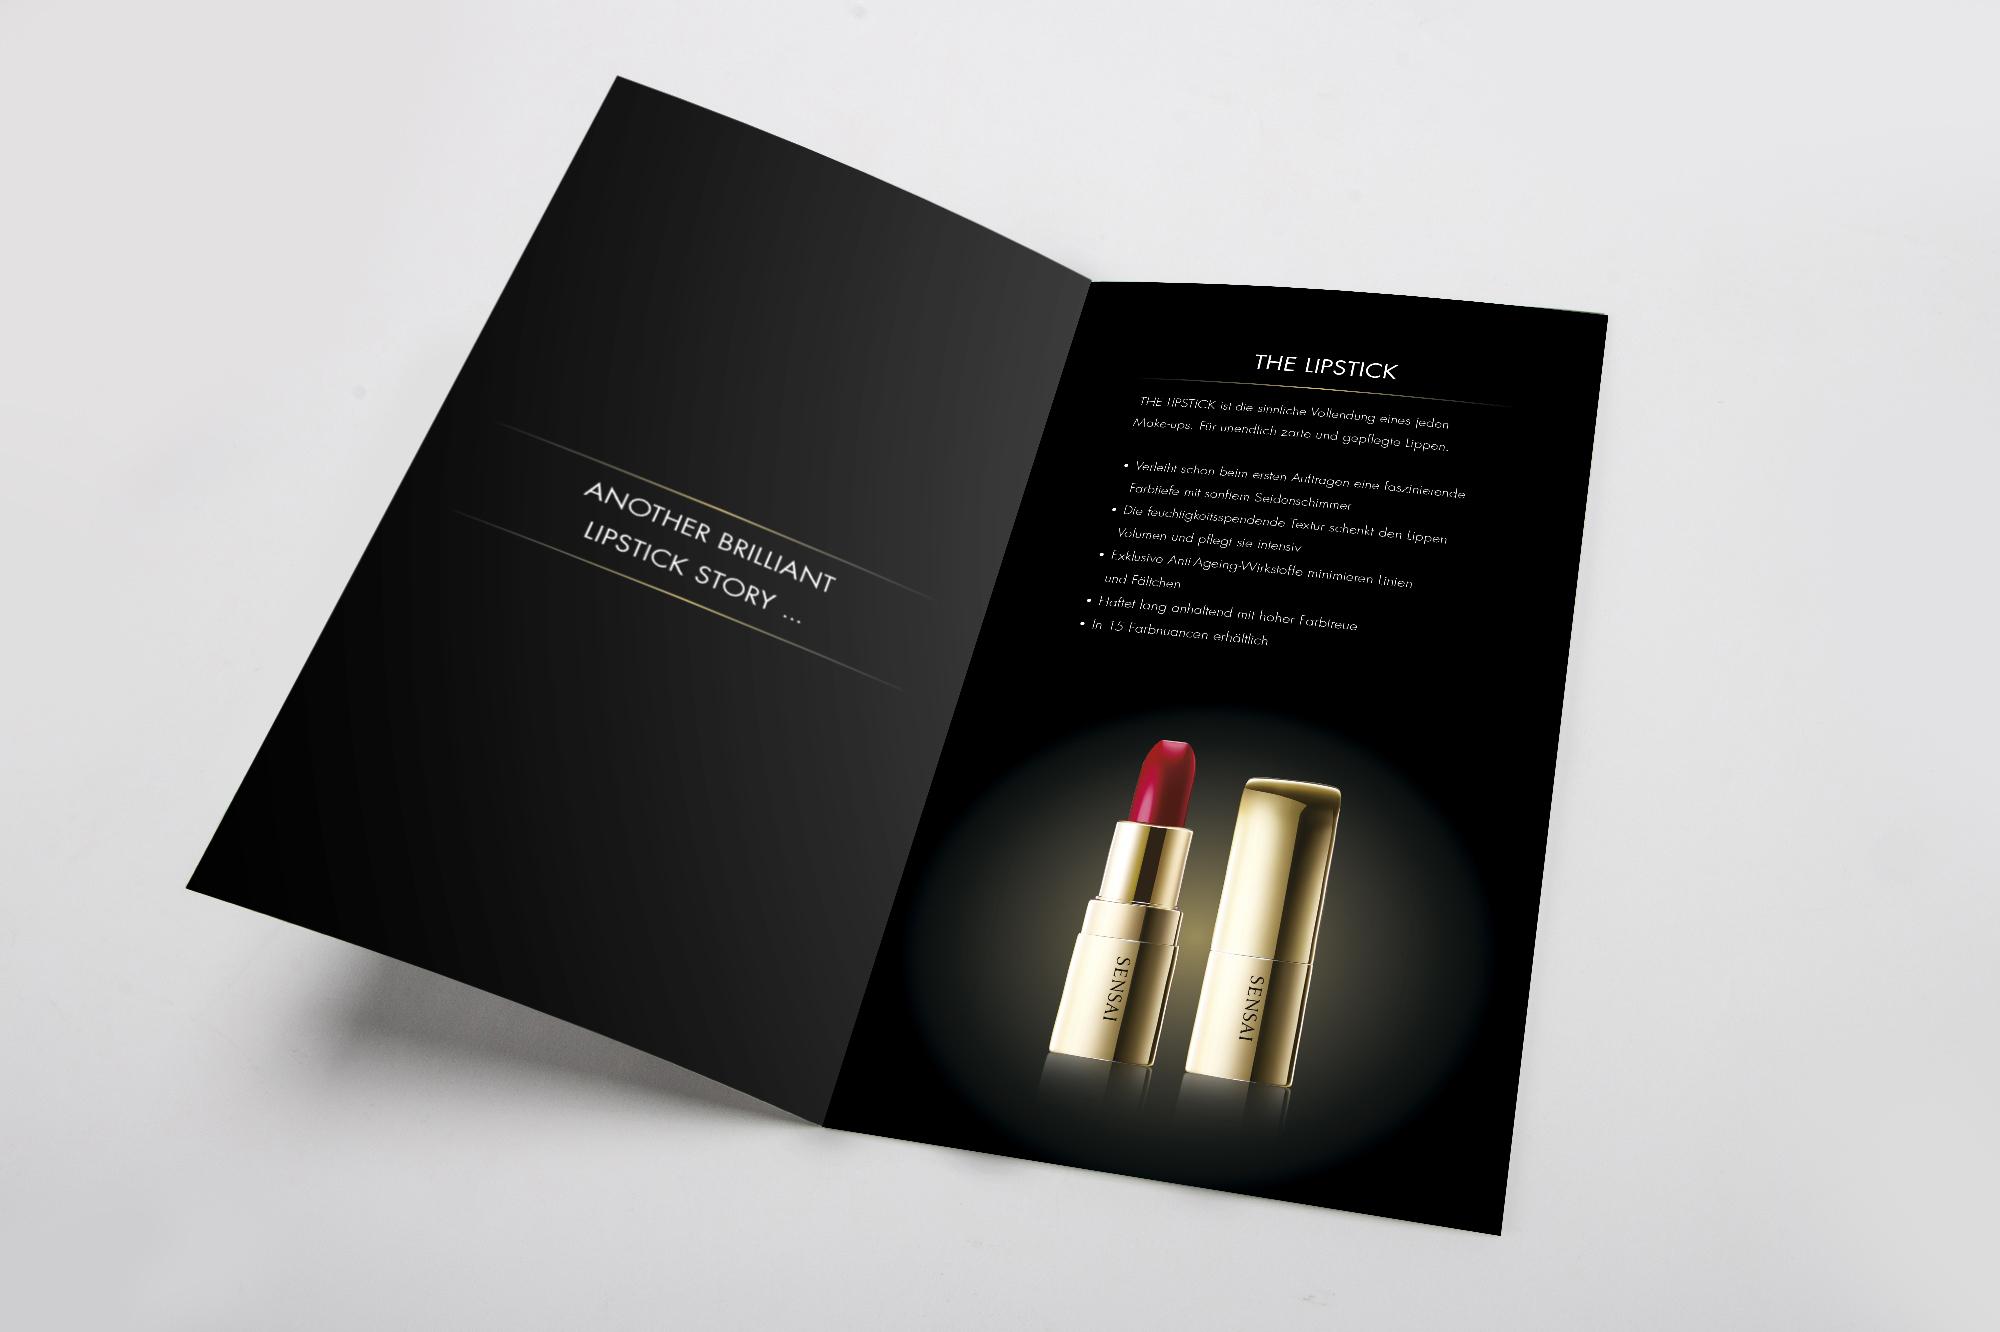 lipstickmailing_02.jpg